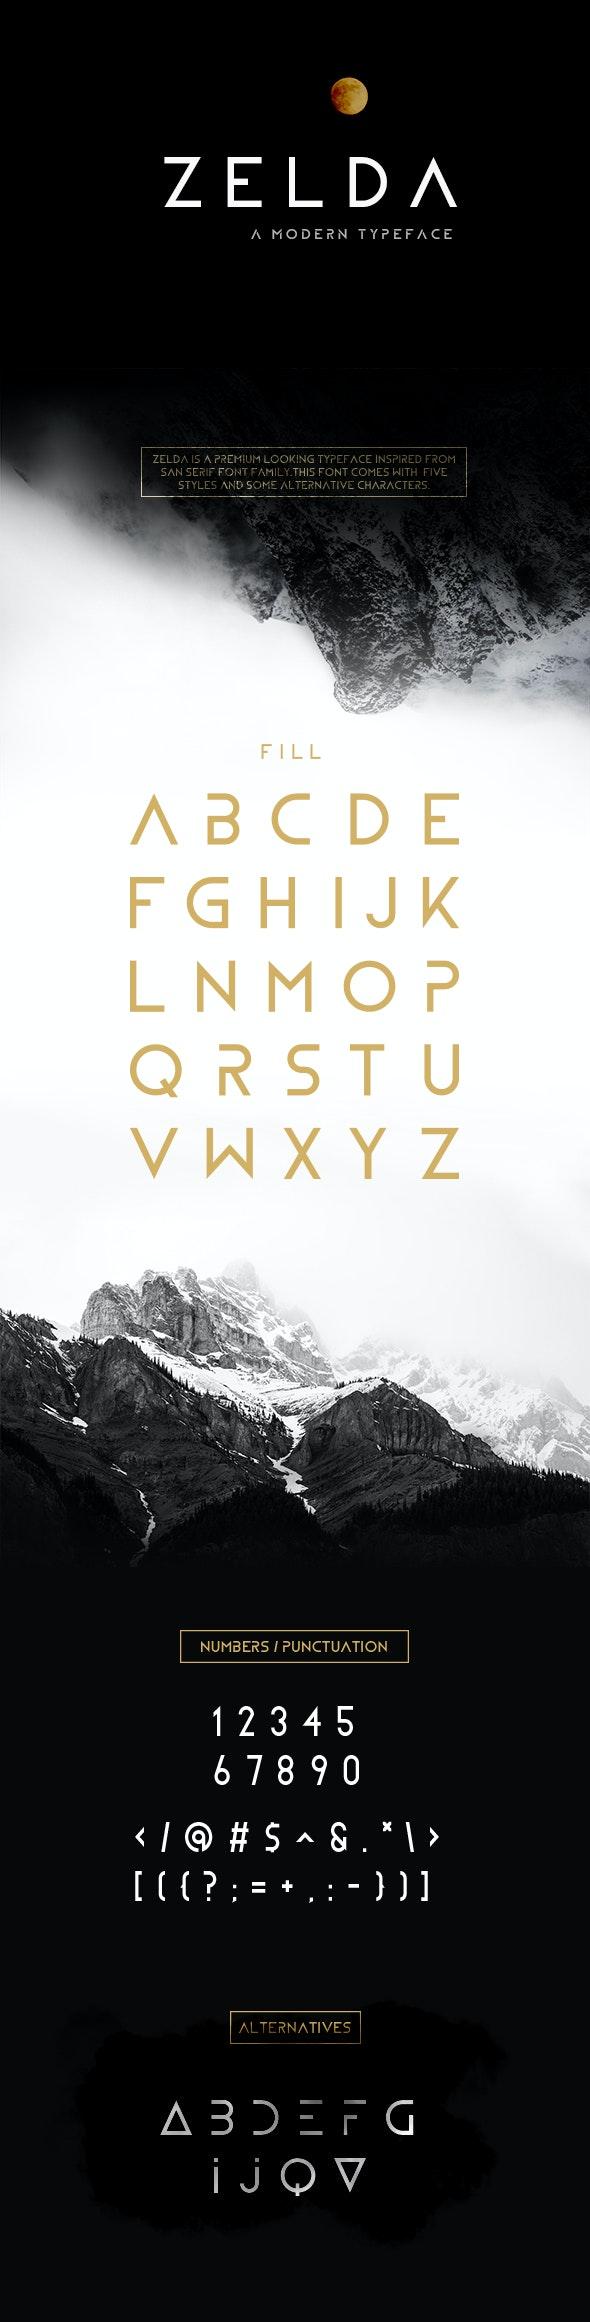 ZELDA Typeface (Fill) - Sans-Serif Fonts